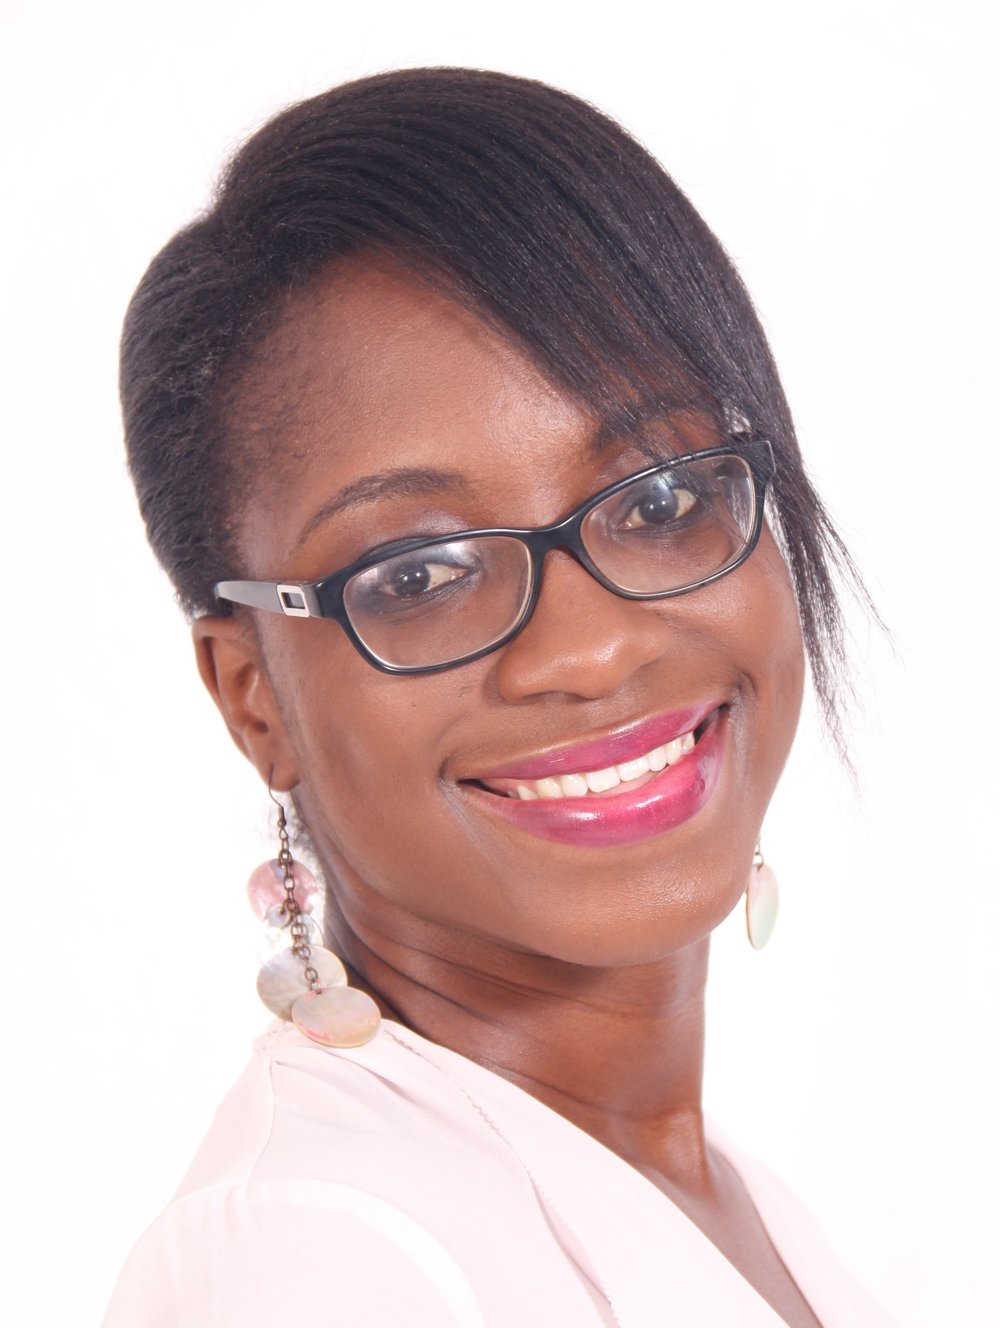 Dinah Hanson, Founder, Aspyre Growth Accelerator